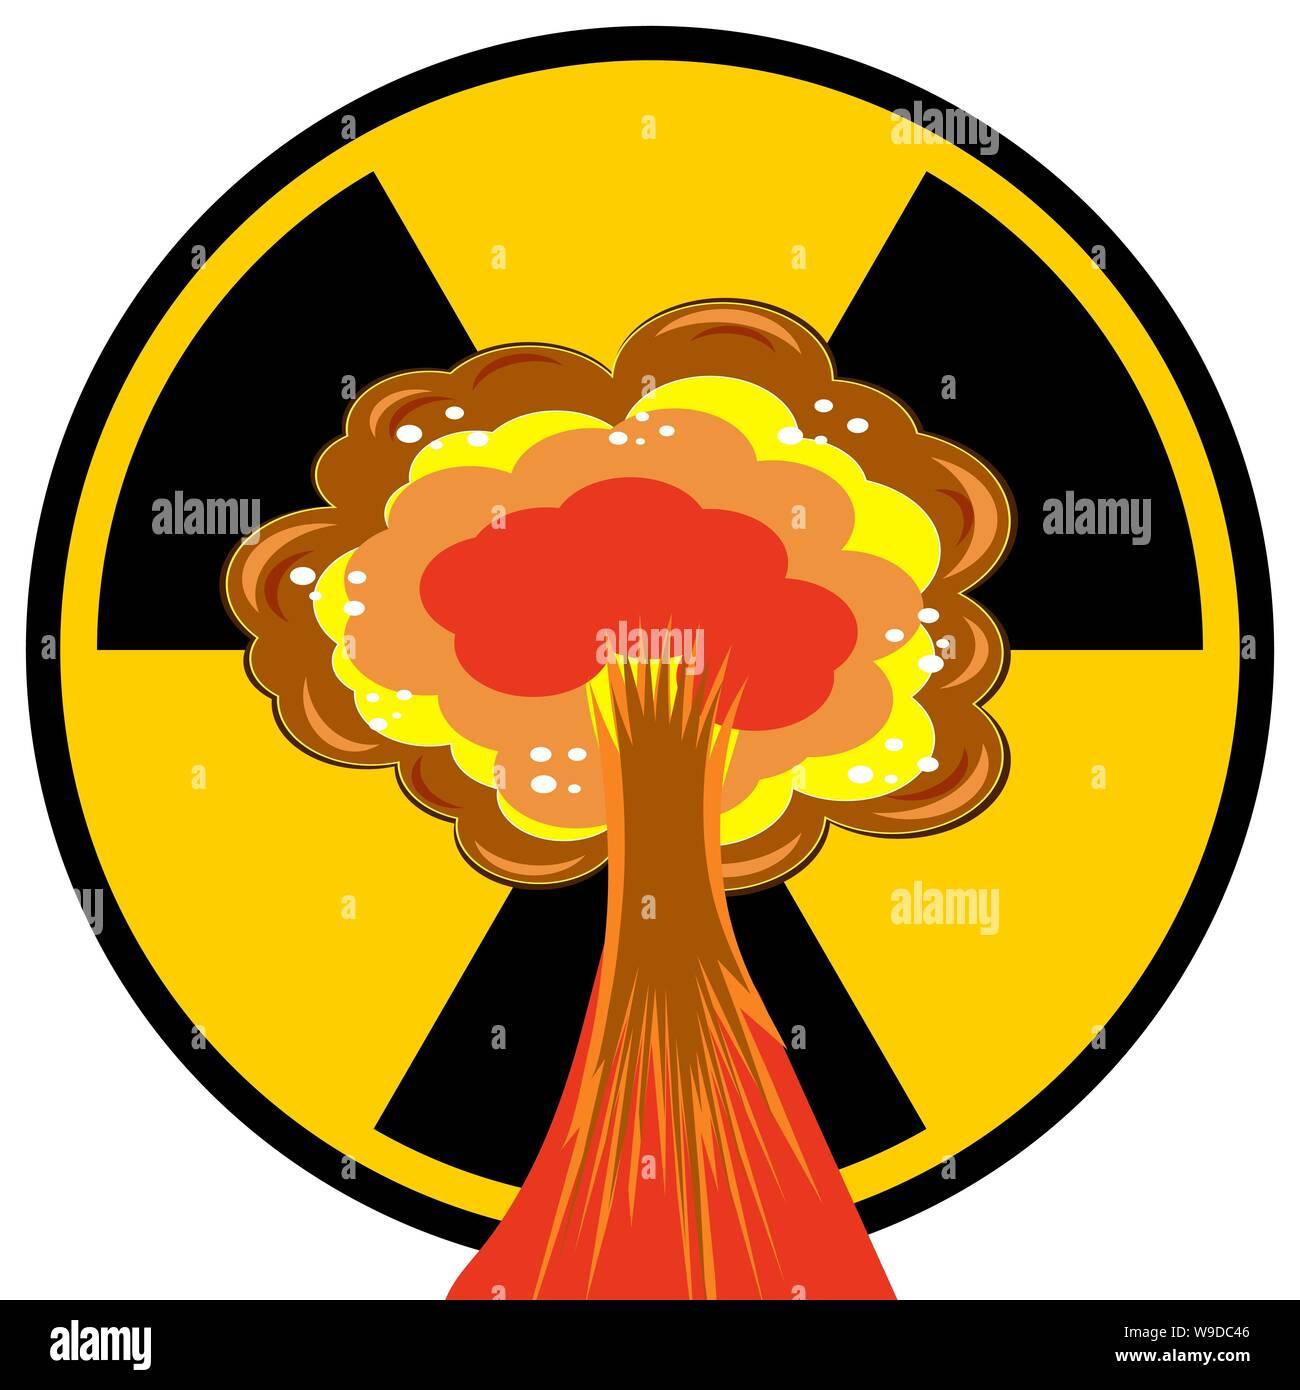 nuclear burst cartoon bomb explosion radioactive atomic power mushroom cloud ionizing radiation sign stock vector image art alamy https www alamy com nuclear burst cartoon bomb explosion radioactive atomic power mushroom cloud ionizing radiation sign image263982326 html